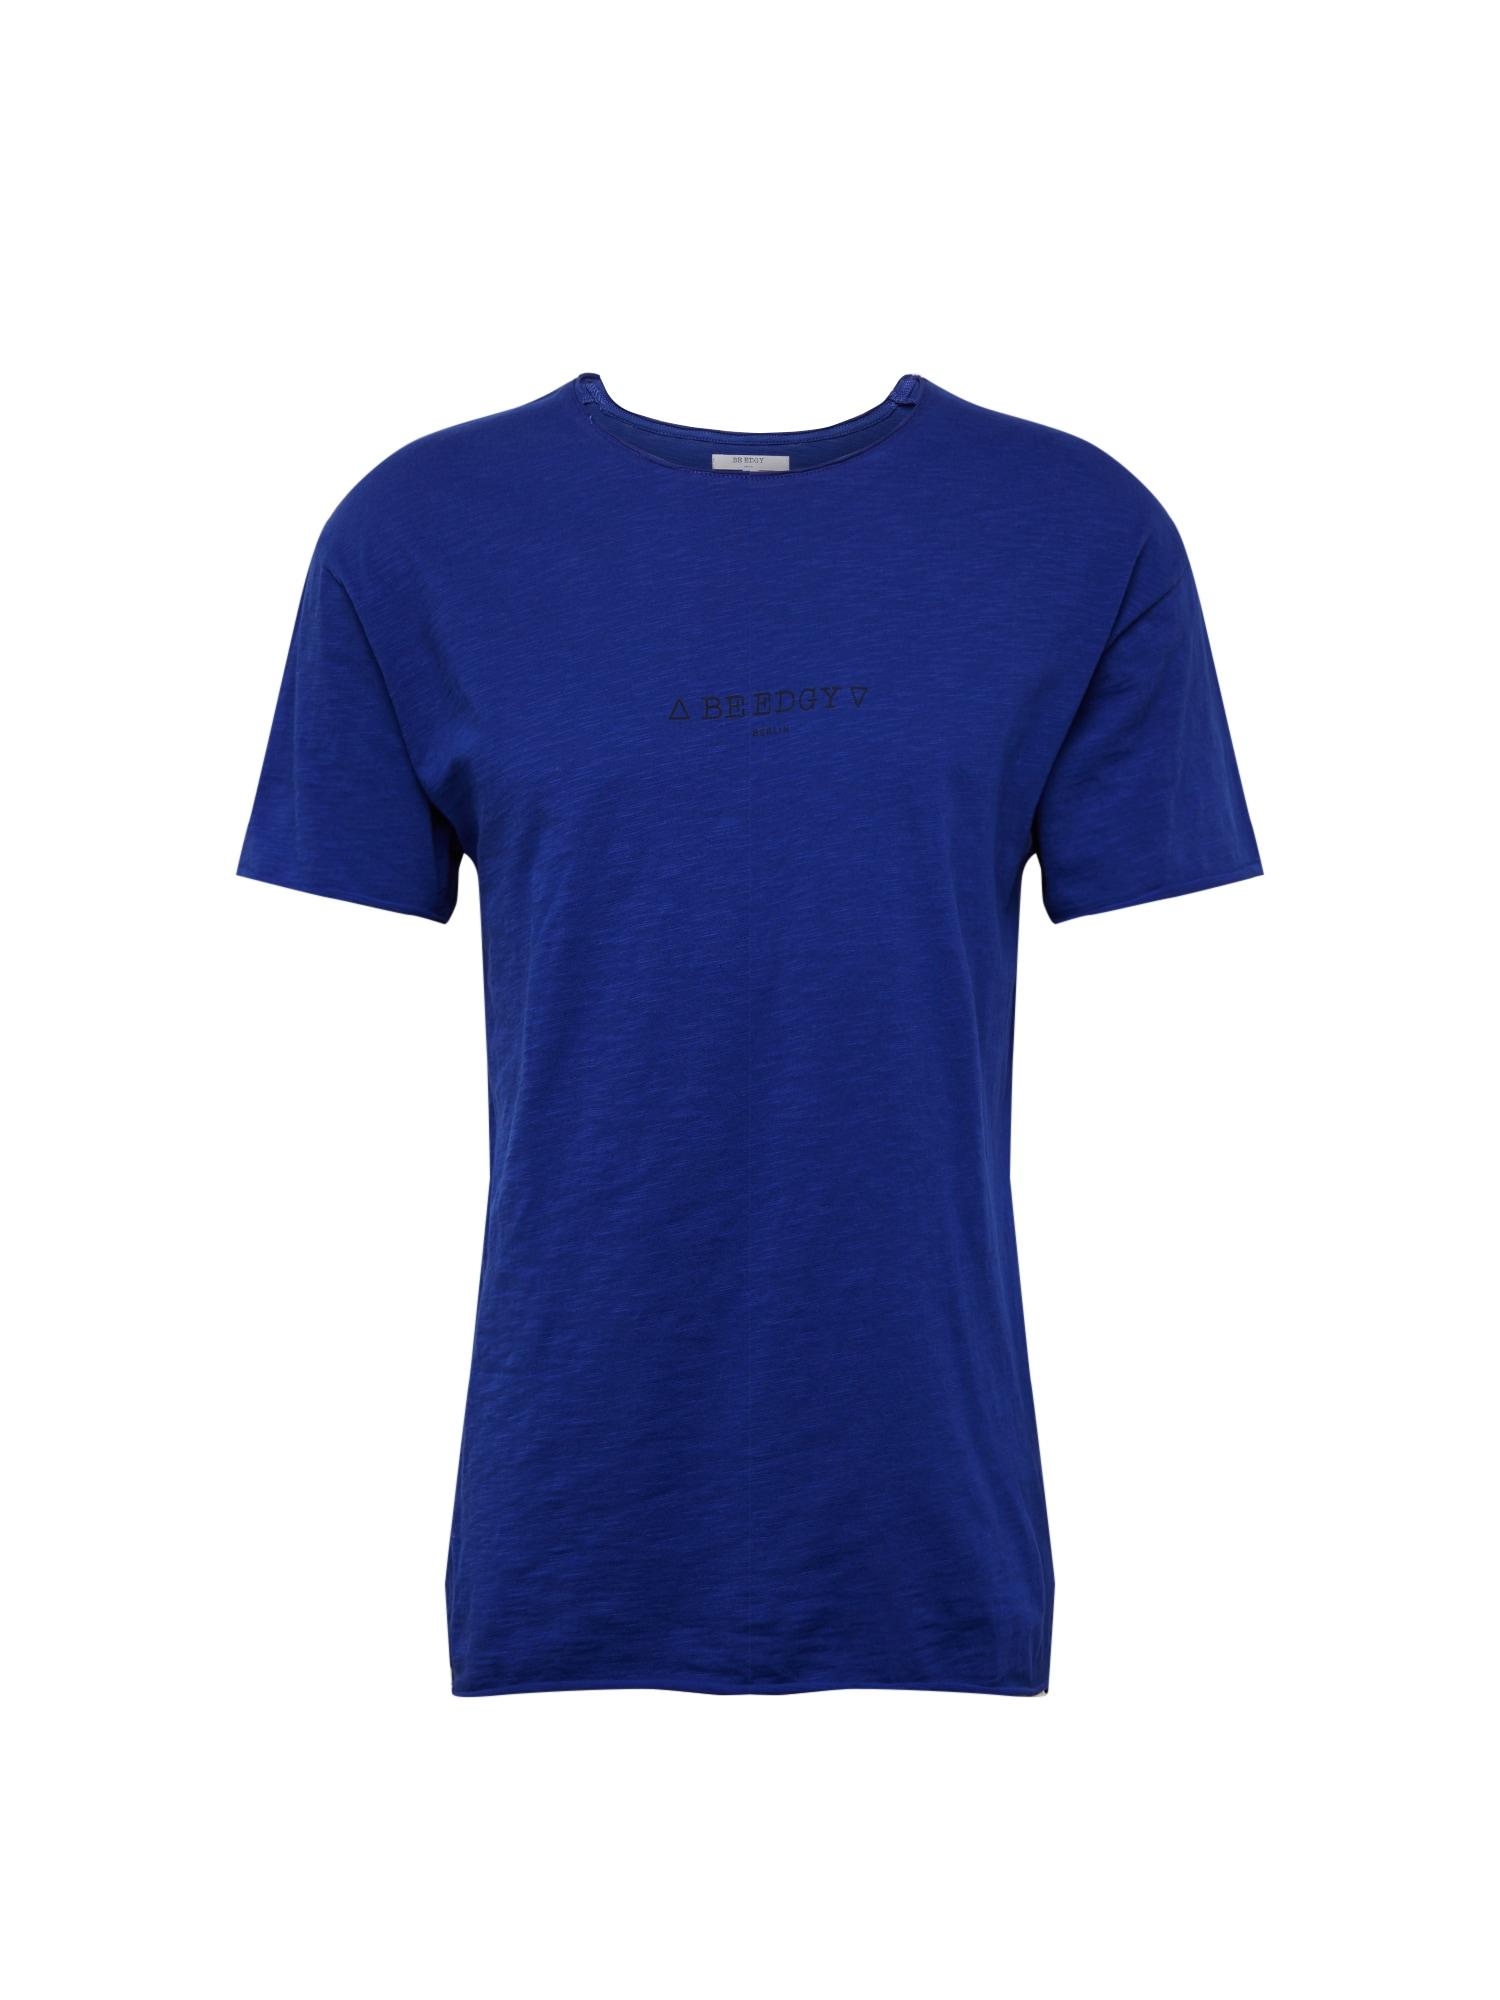 BE EDGY Marškinėliai 'BEdustin' mėlyna